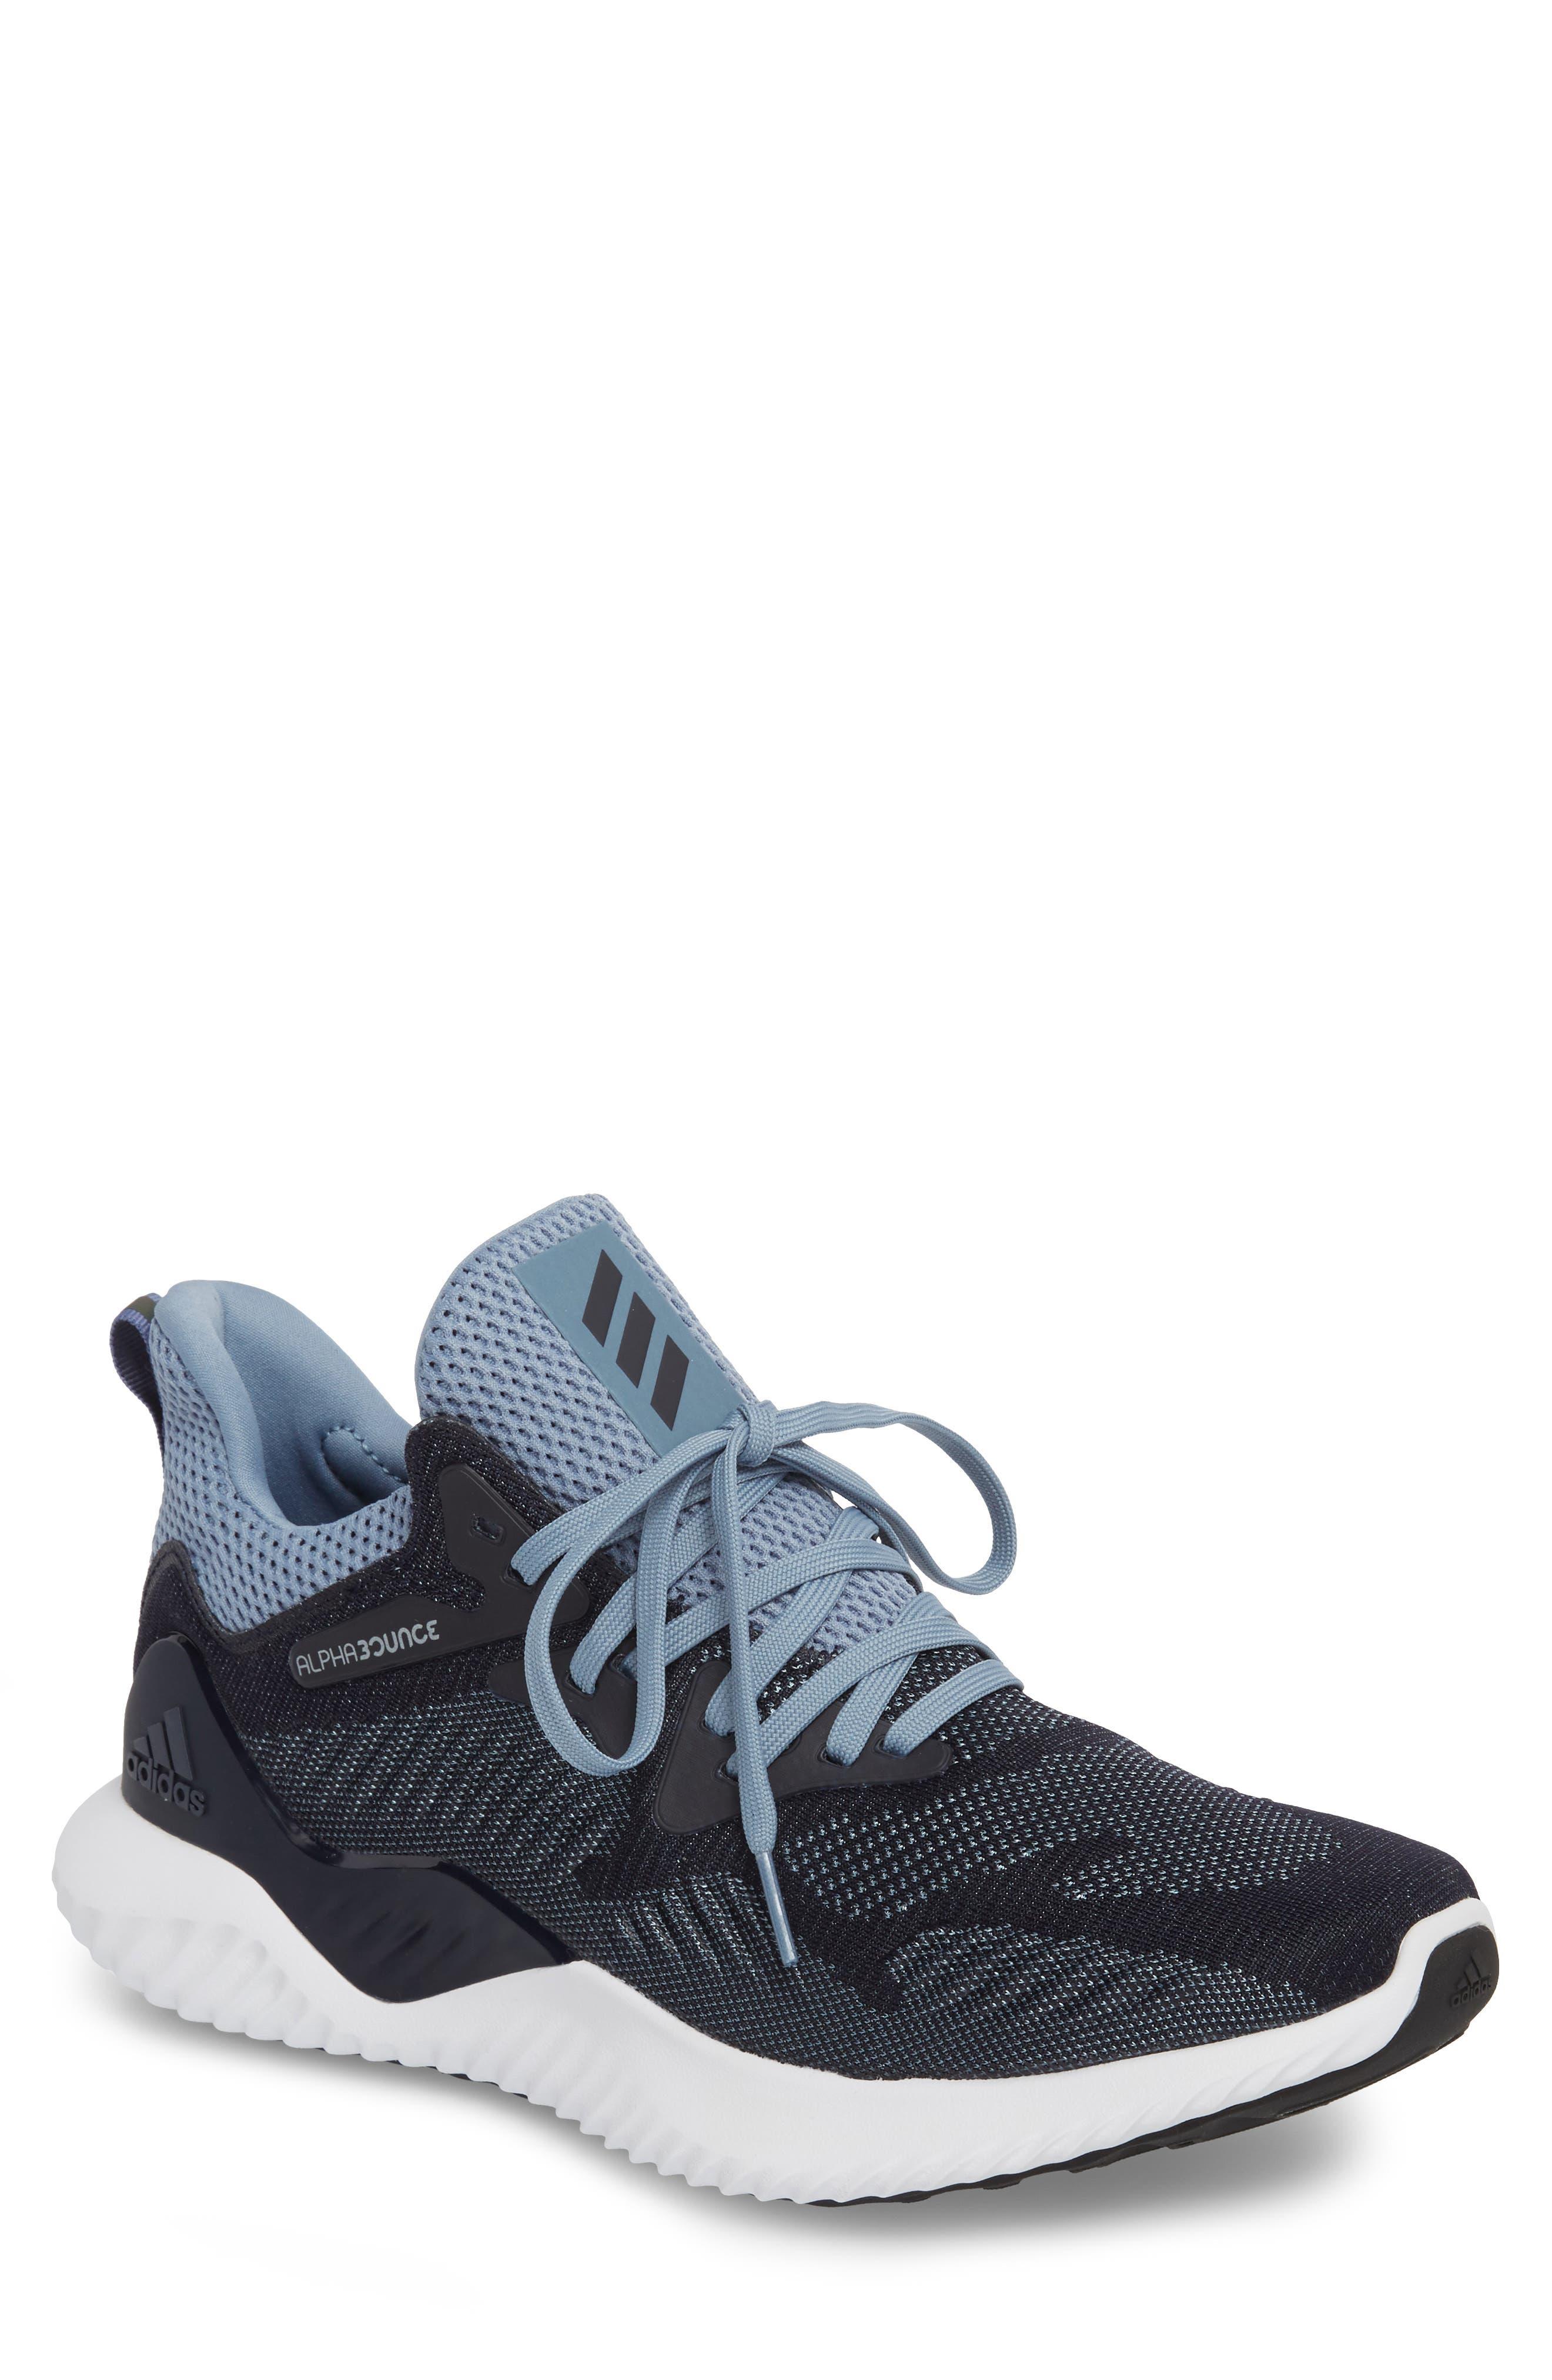 Alternate Image 1 Selected - adidas AlphaBounce Beyond Knit Running Shoe (Men)